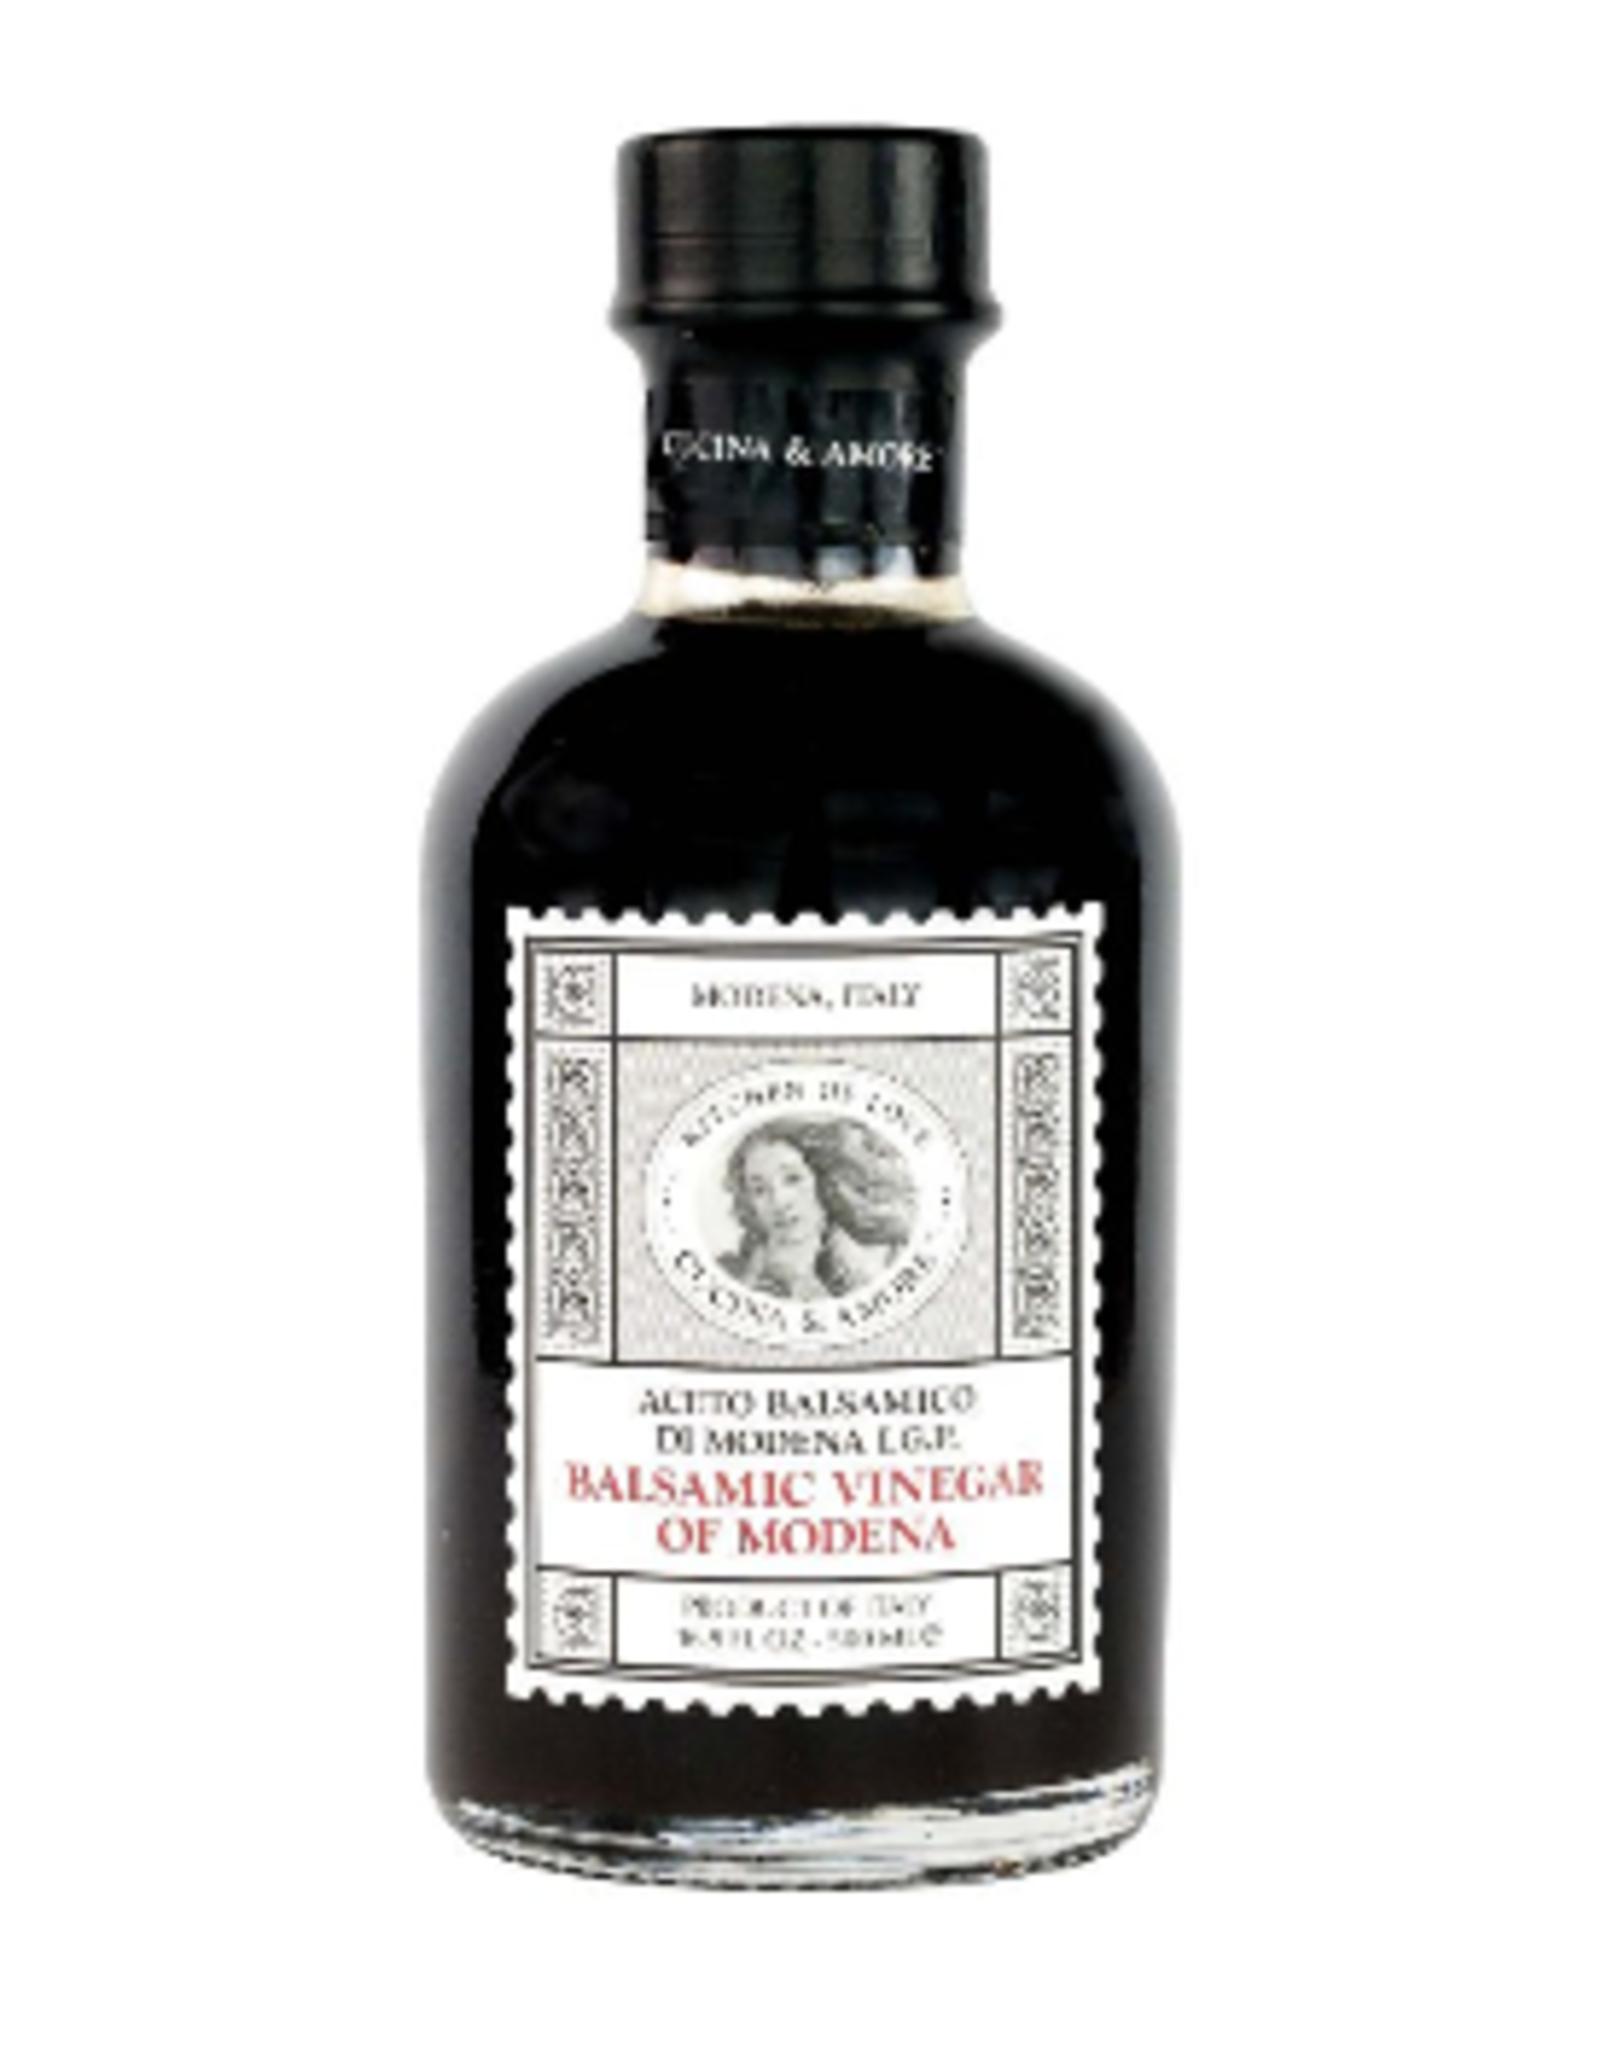 First Source Cucina & Amore Balsamic Vinegar